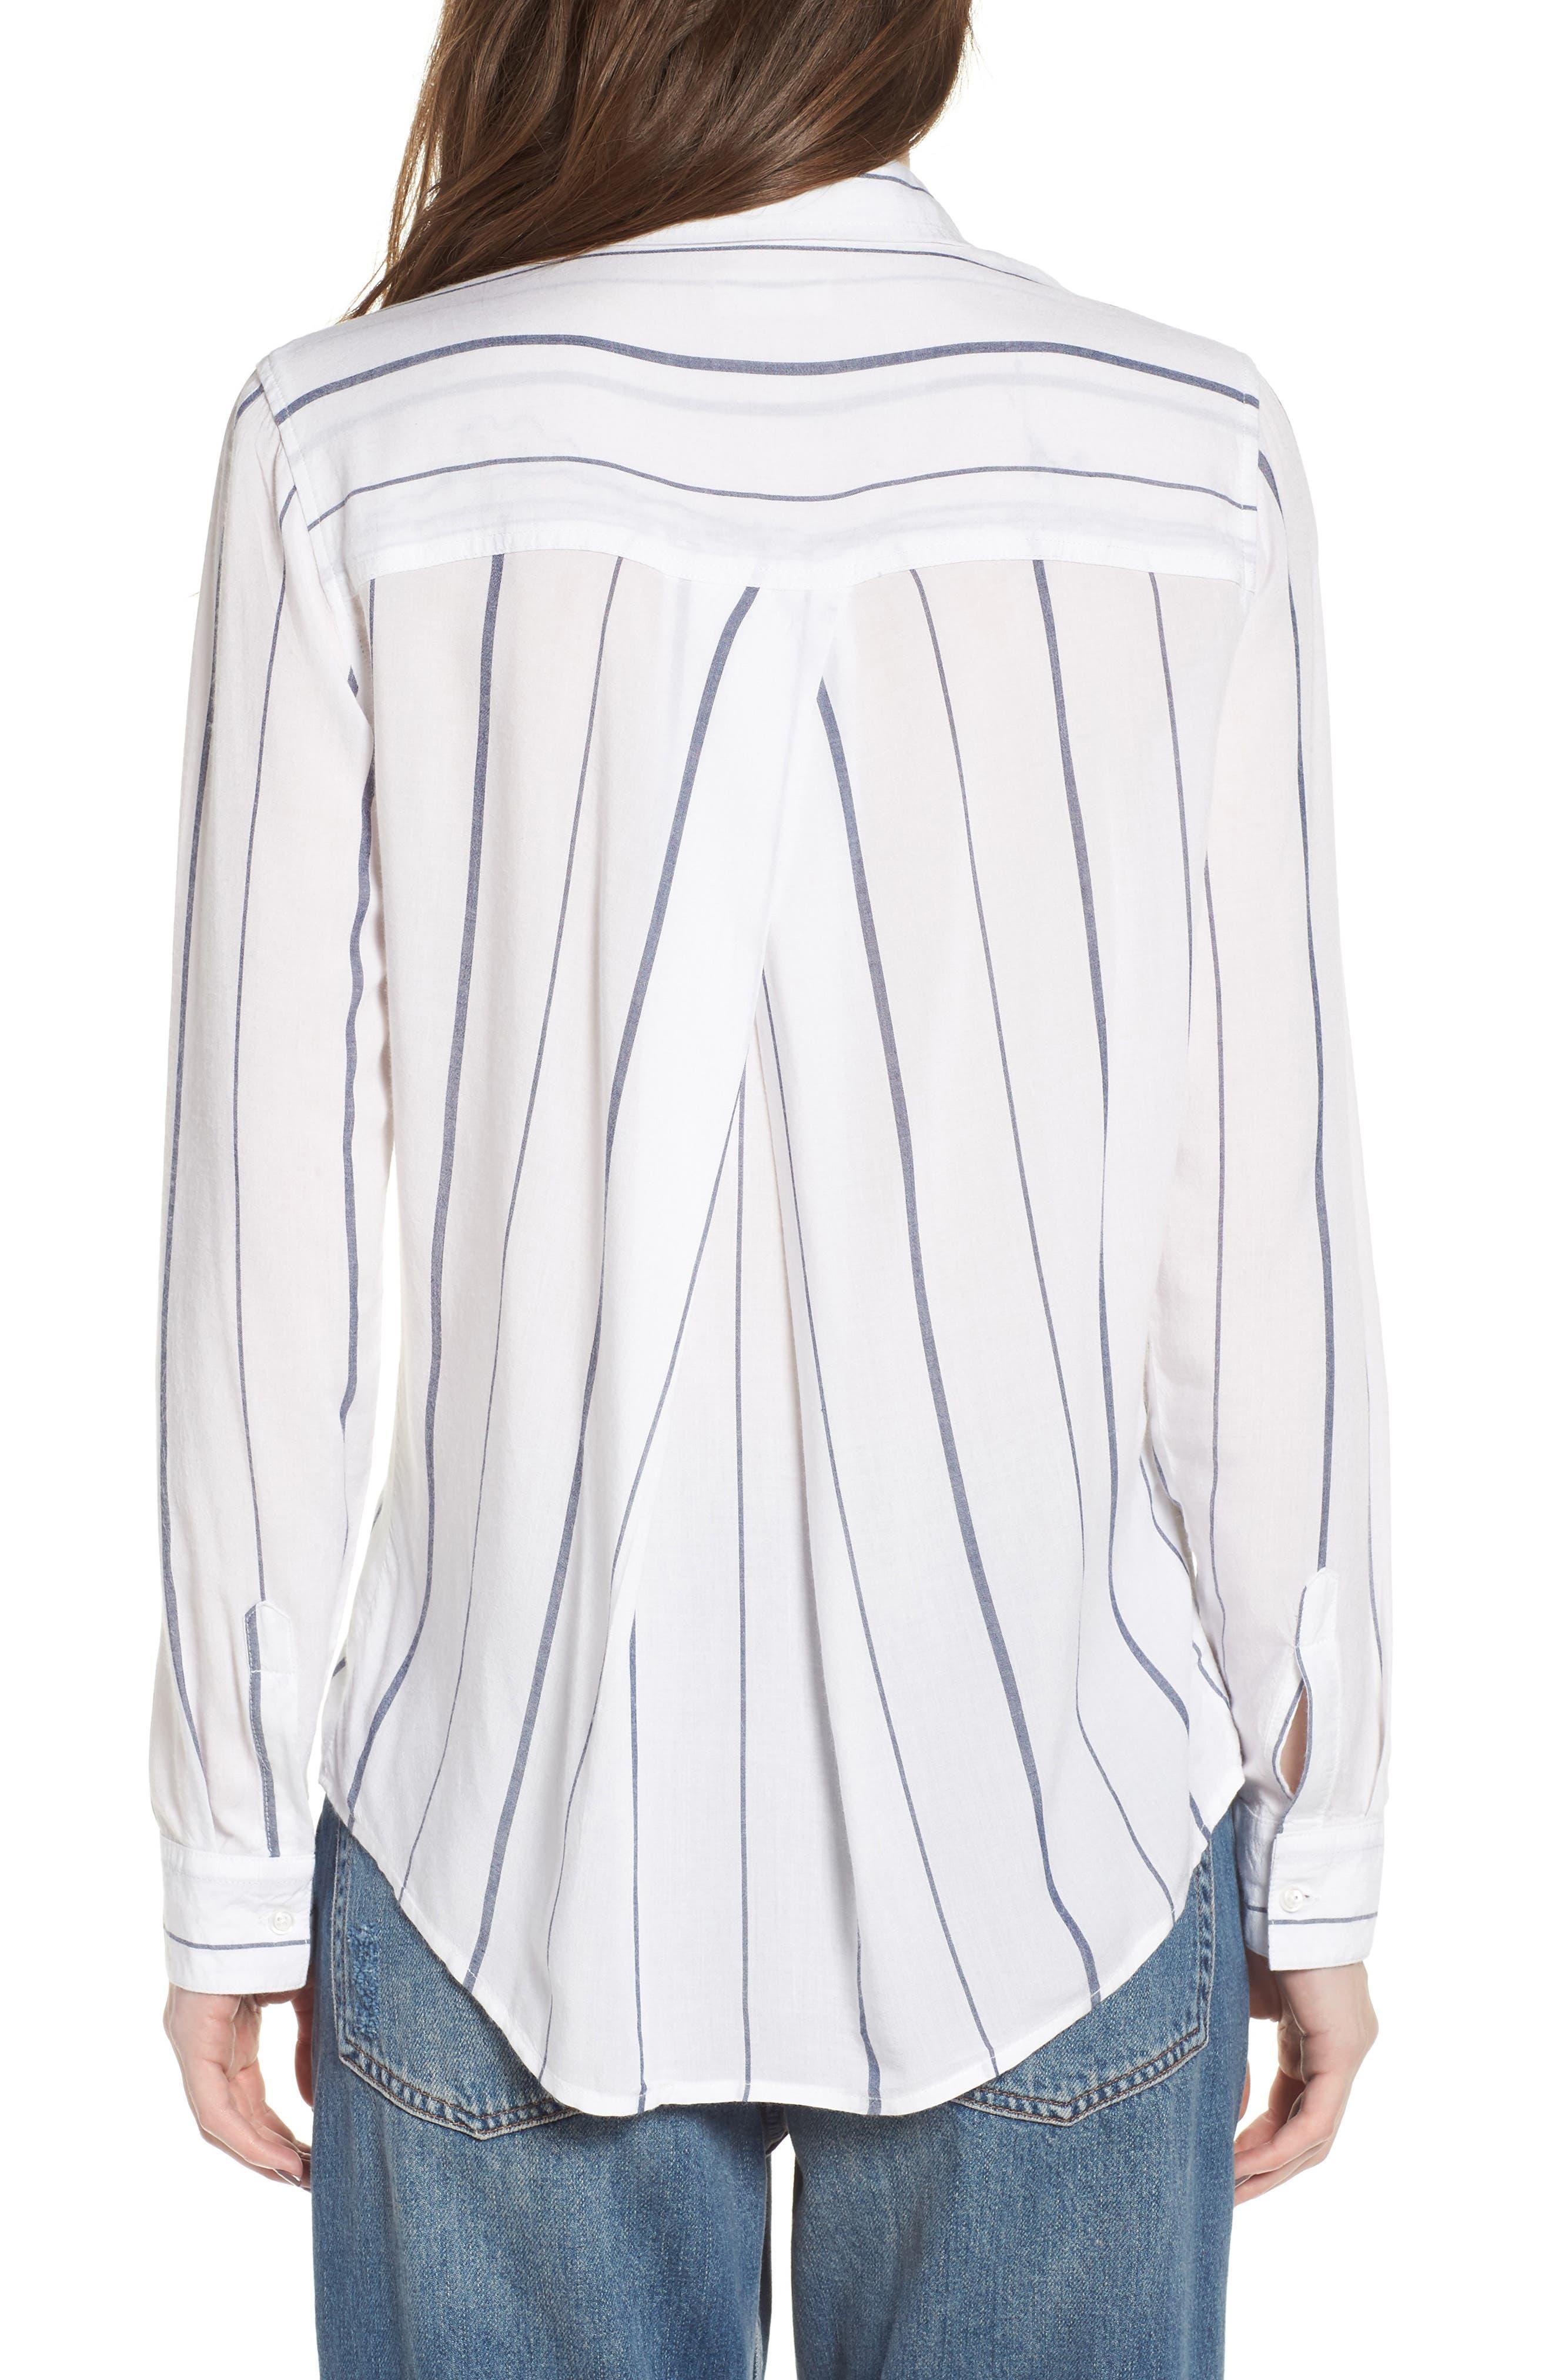 Canyons Stripe Shirt,                             Alternate thumbnail 2, color,                             100